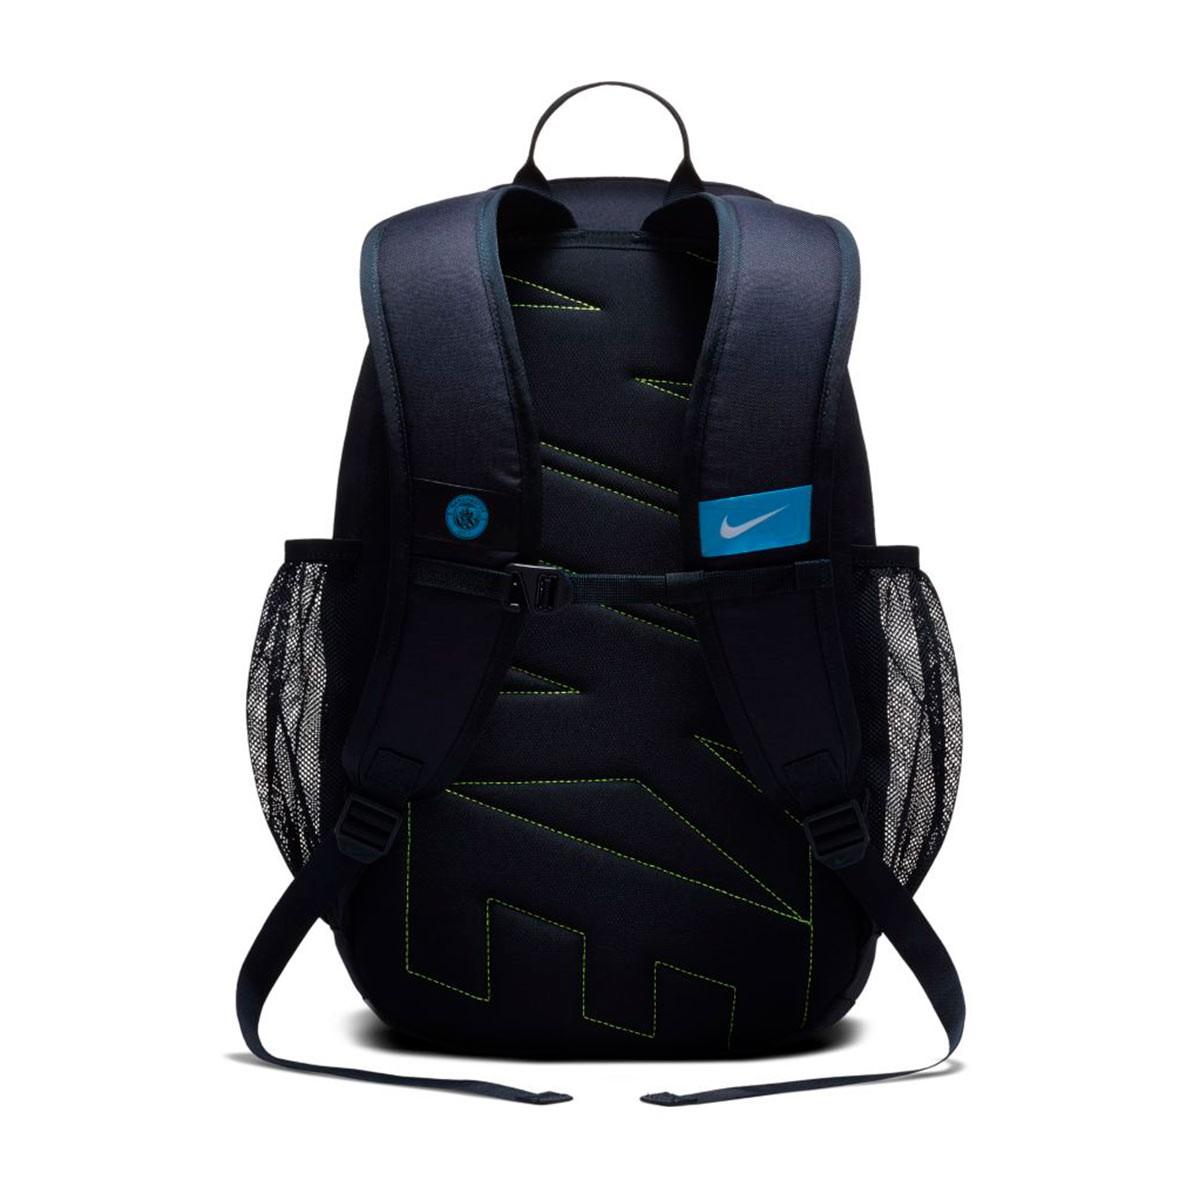 fde35a7d93 Backpack Nike Manchester City FC Stadium 2018-2019 Dark Obsidian ...